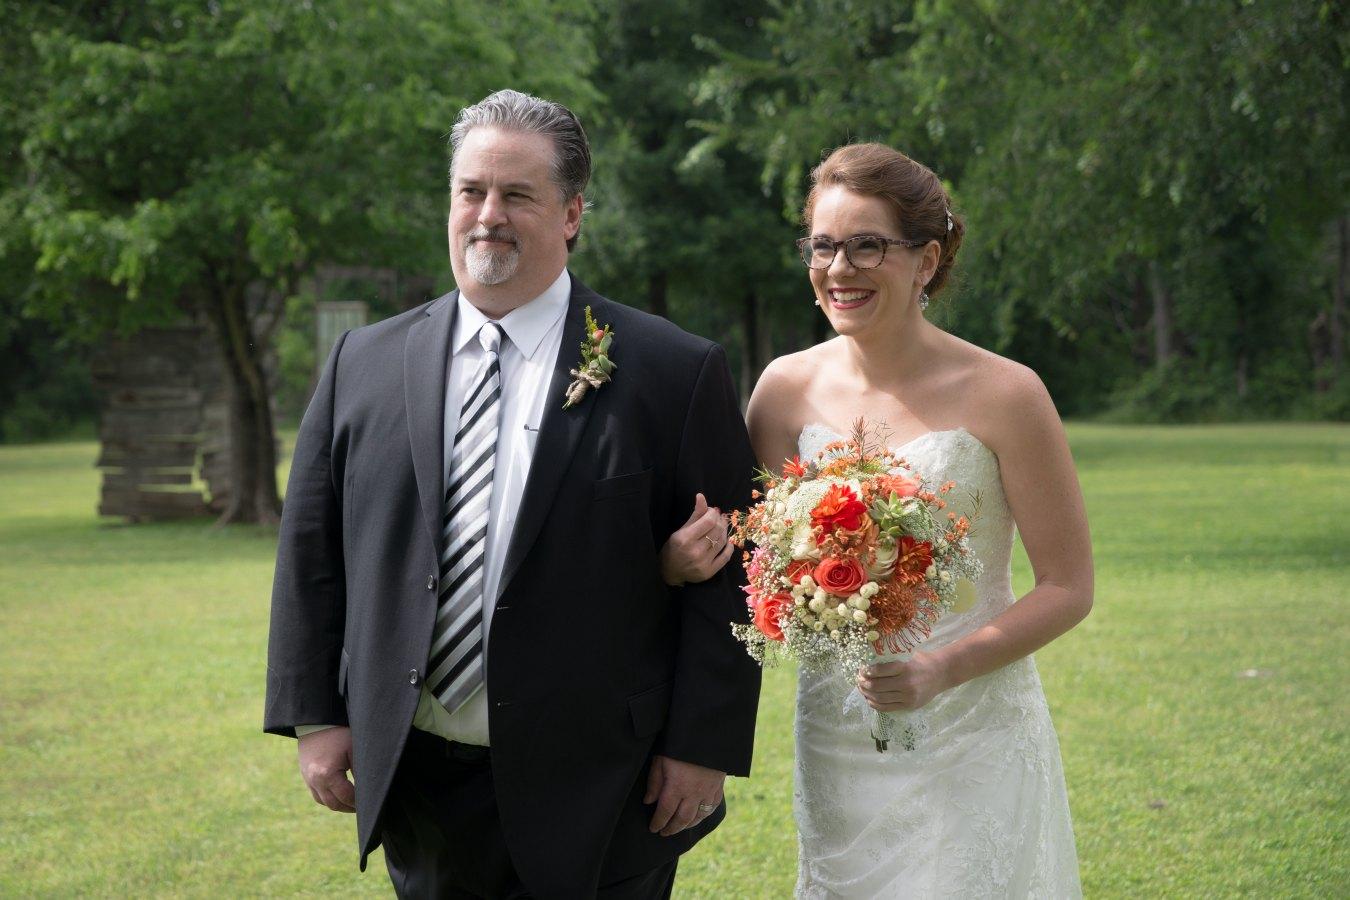 HighDot-Studios-Wedding-Cedar-Bend-Event-Center -Austin-Kim and Mike (23)